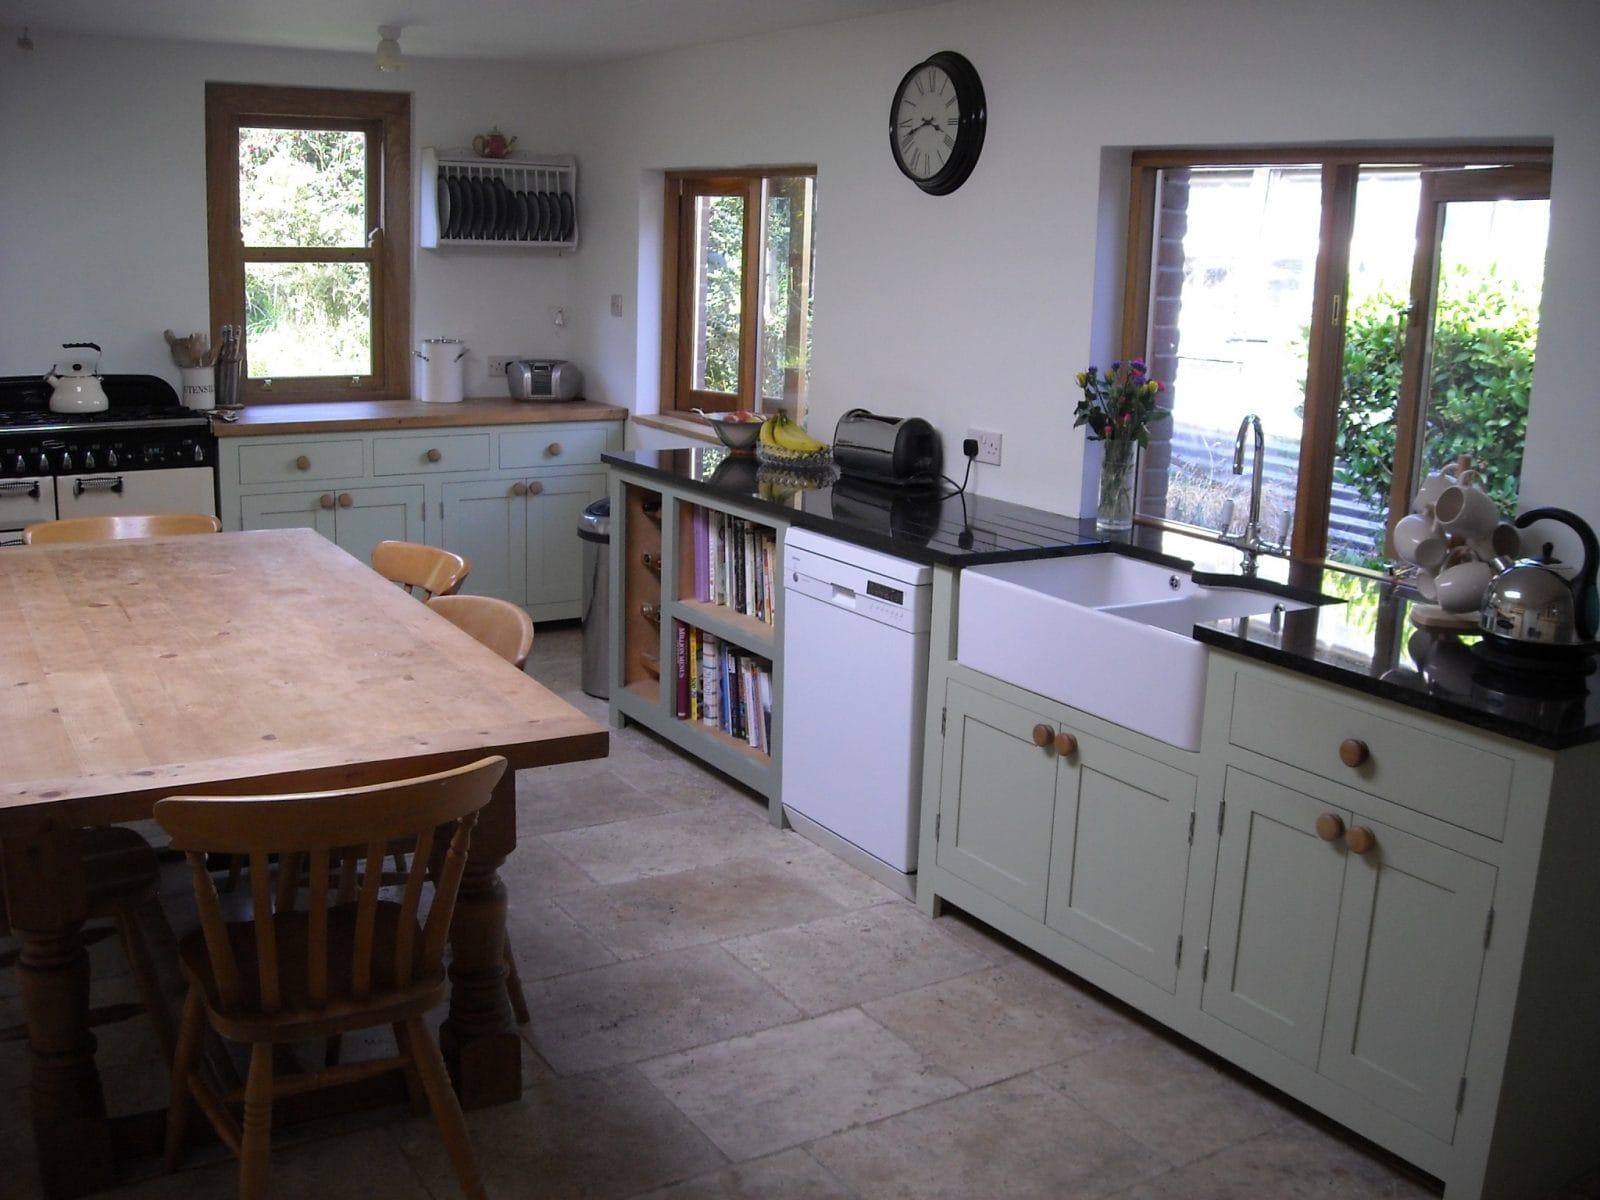 free standing kitchens wallpaper for kitchen backsplash curdridge higham furniture freestanding